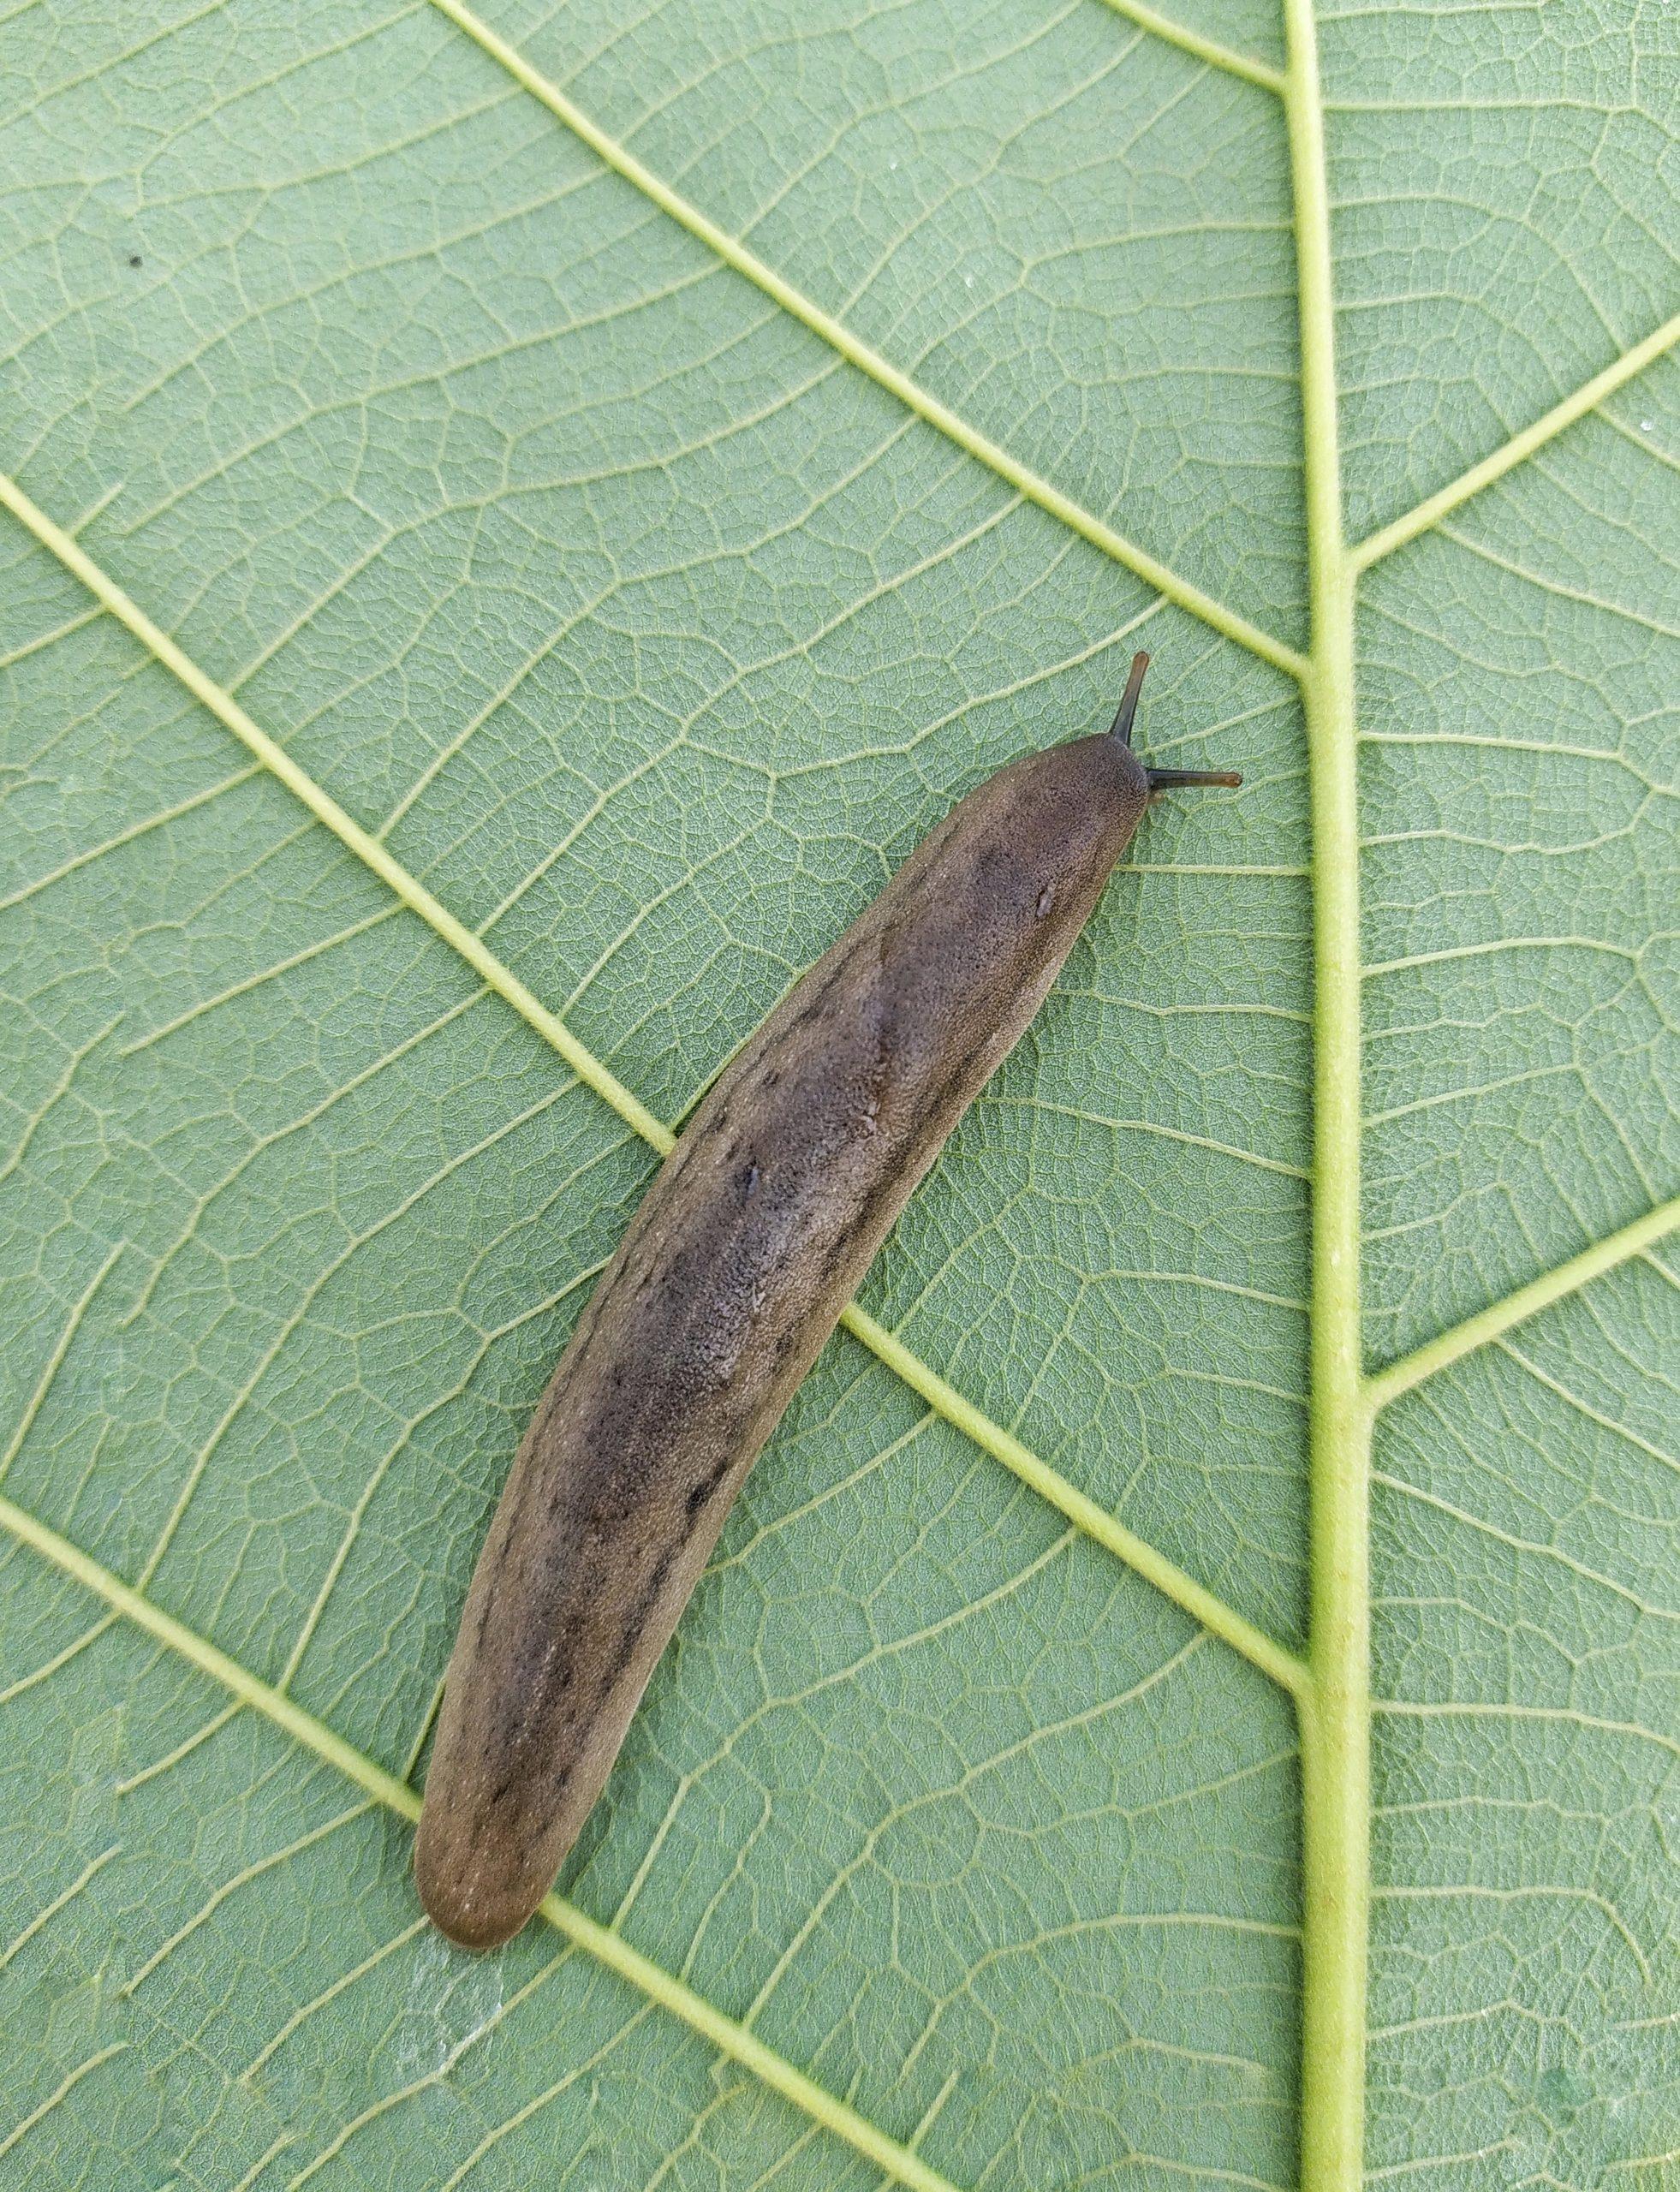 A snail 🐌 on leaf